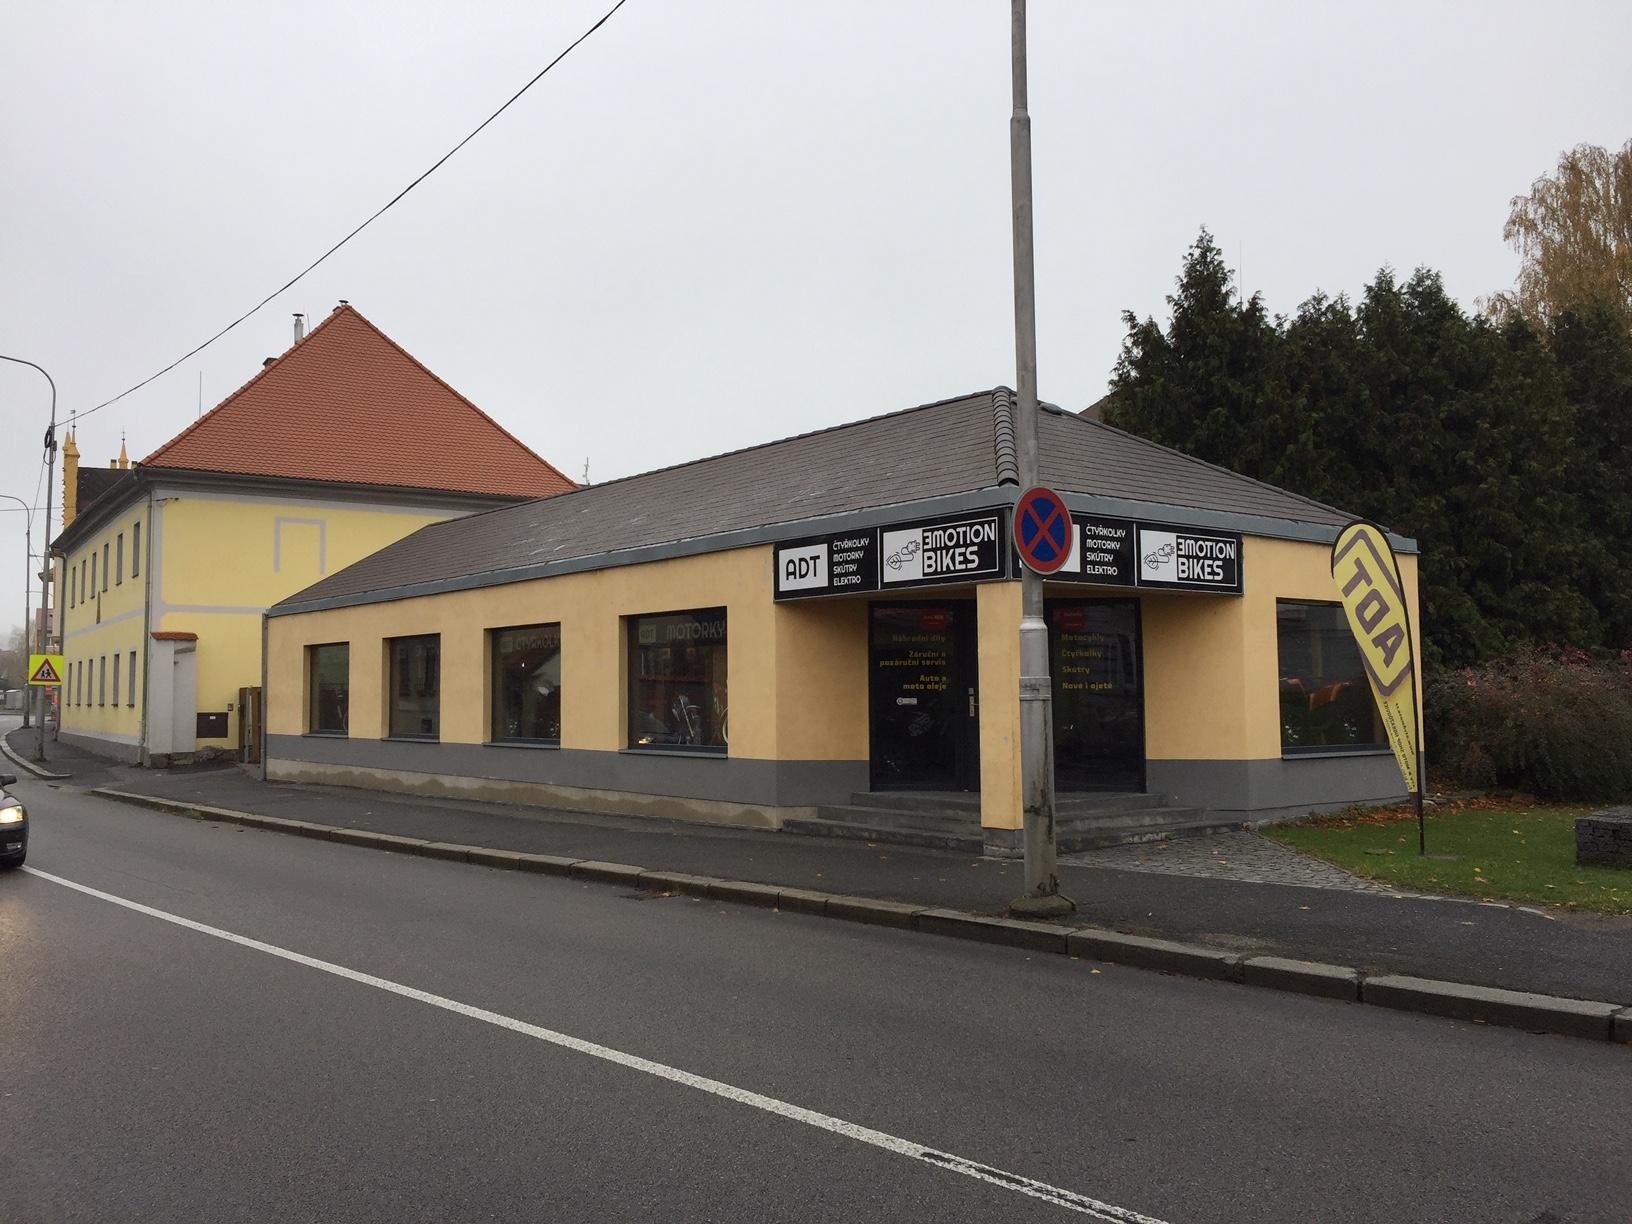 Pobočka Horažďovice, Komenského 213 (ADT Horažďovice)